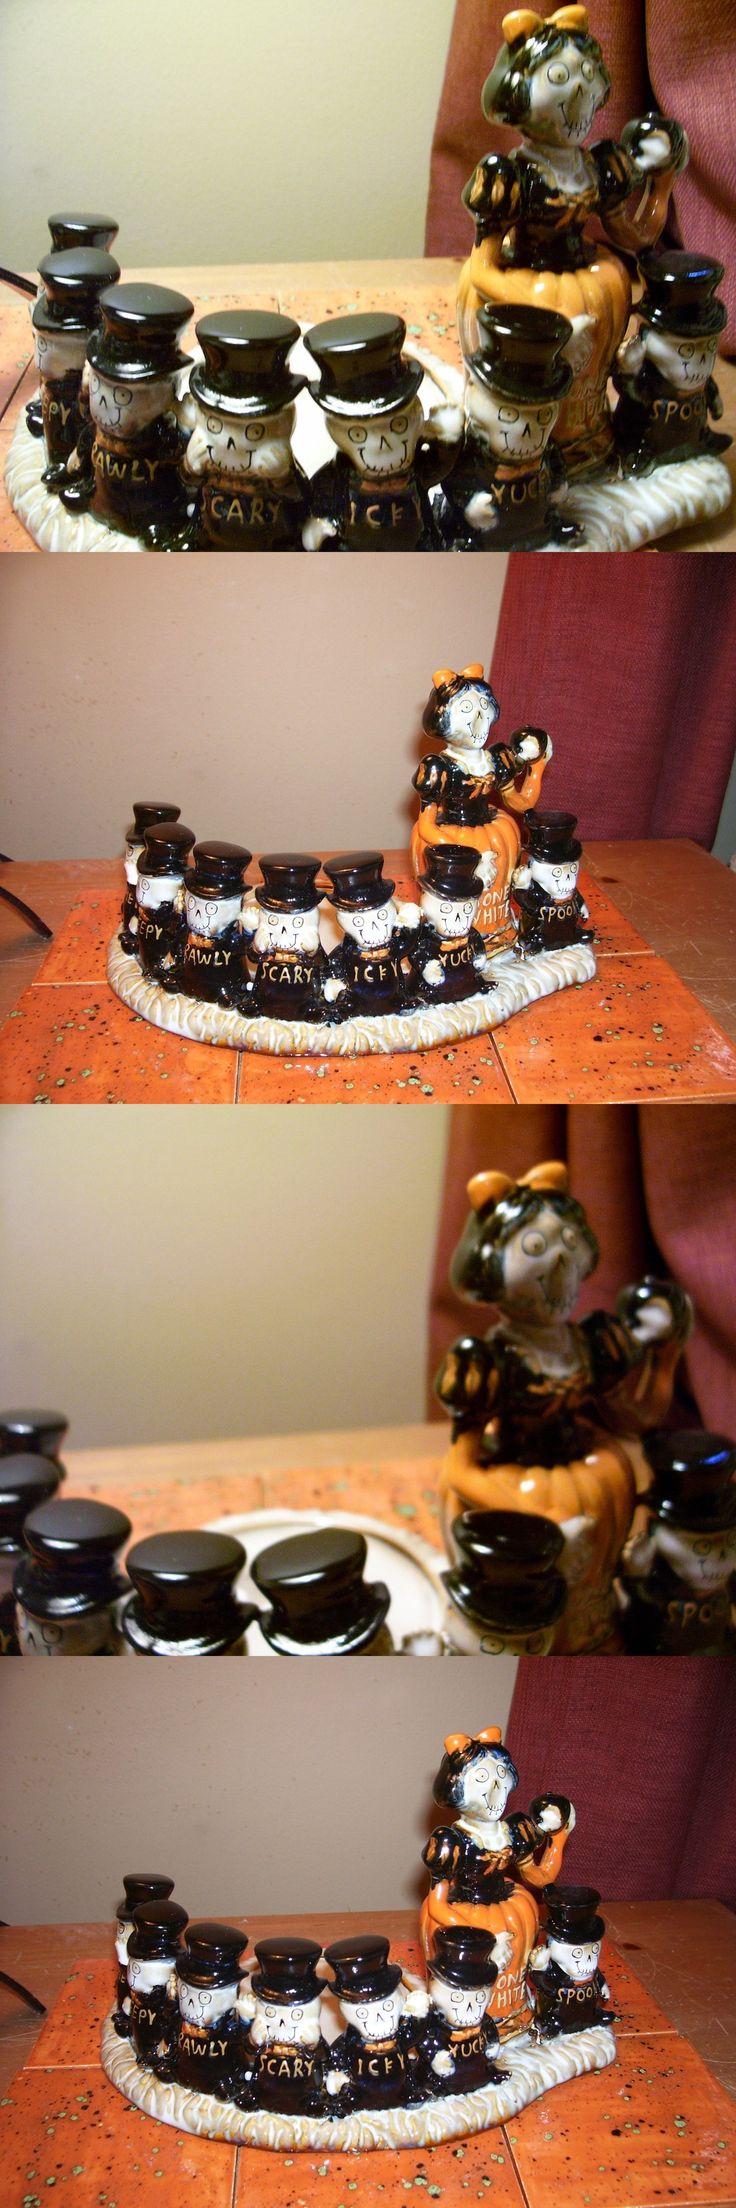 Candles 46782: Yankee Candle Boney Bunch Bone White Boney Family Jar Holder -> BUY IT NOW ONLY: $36 on eBay!